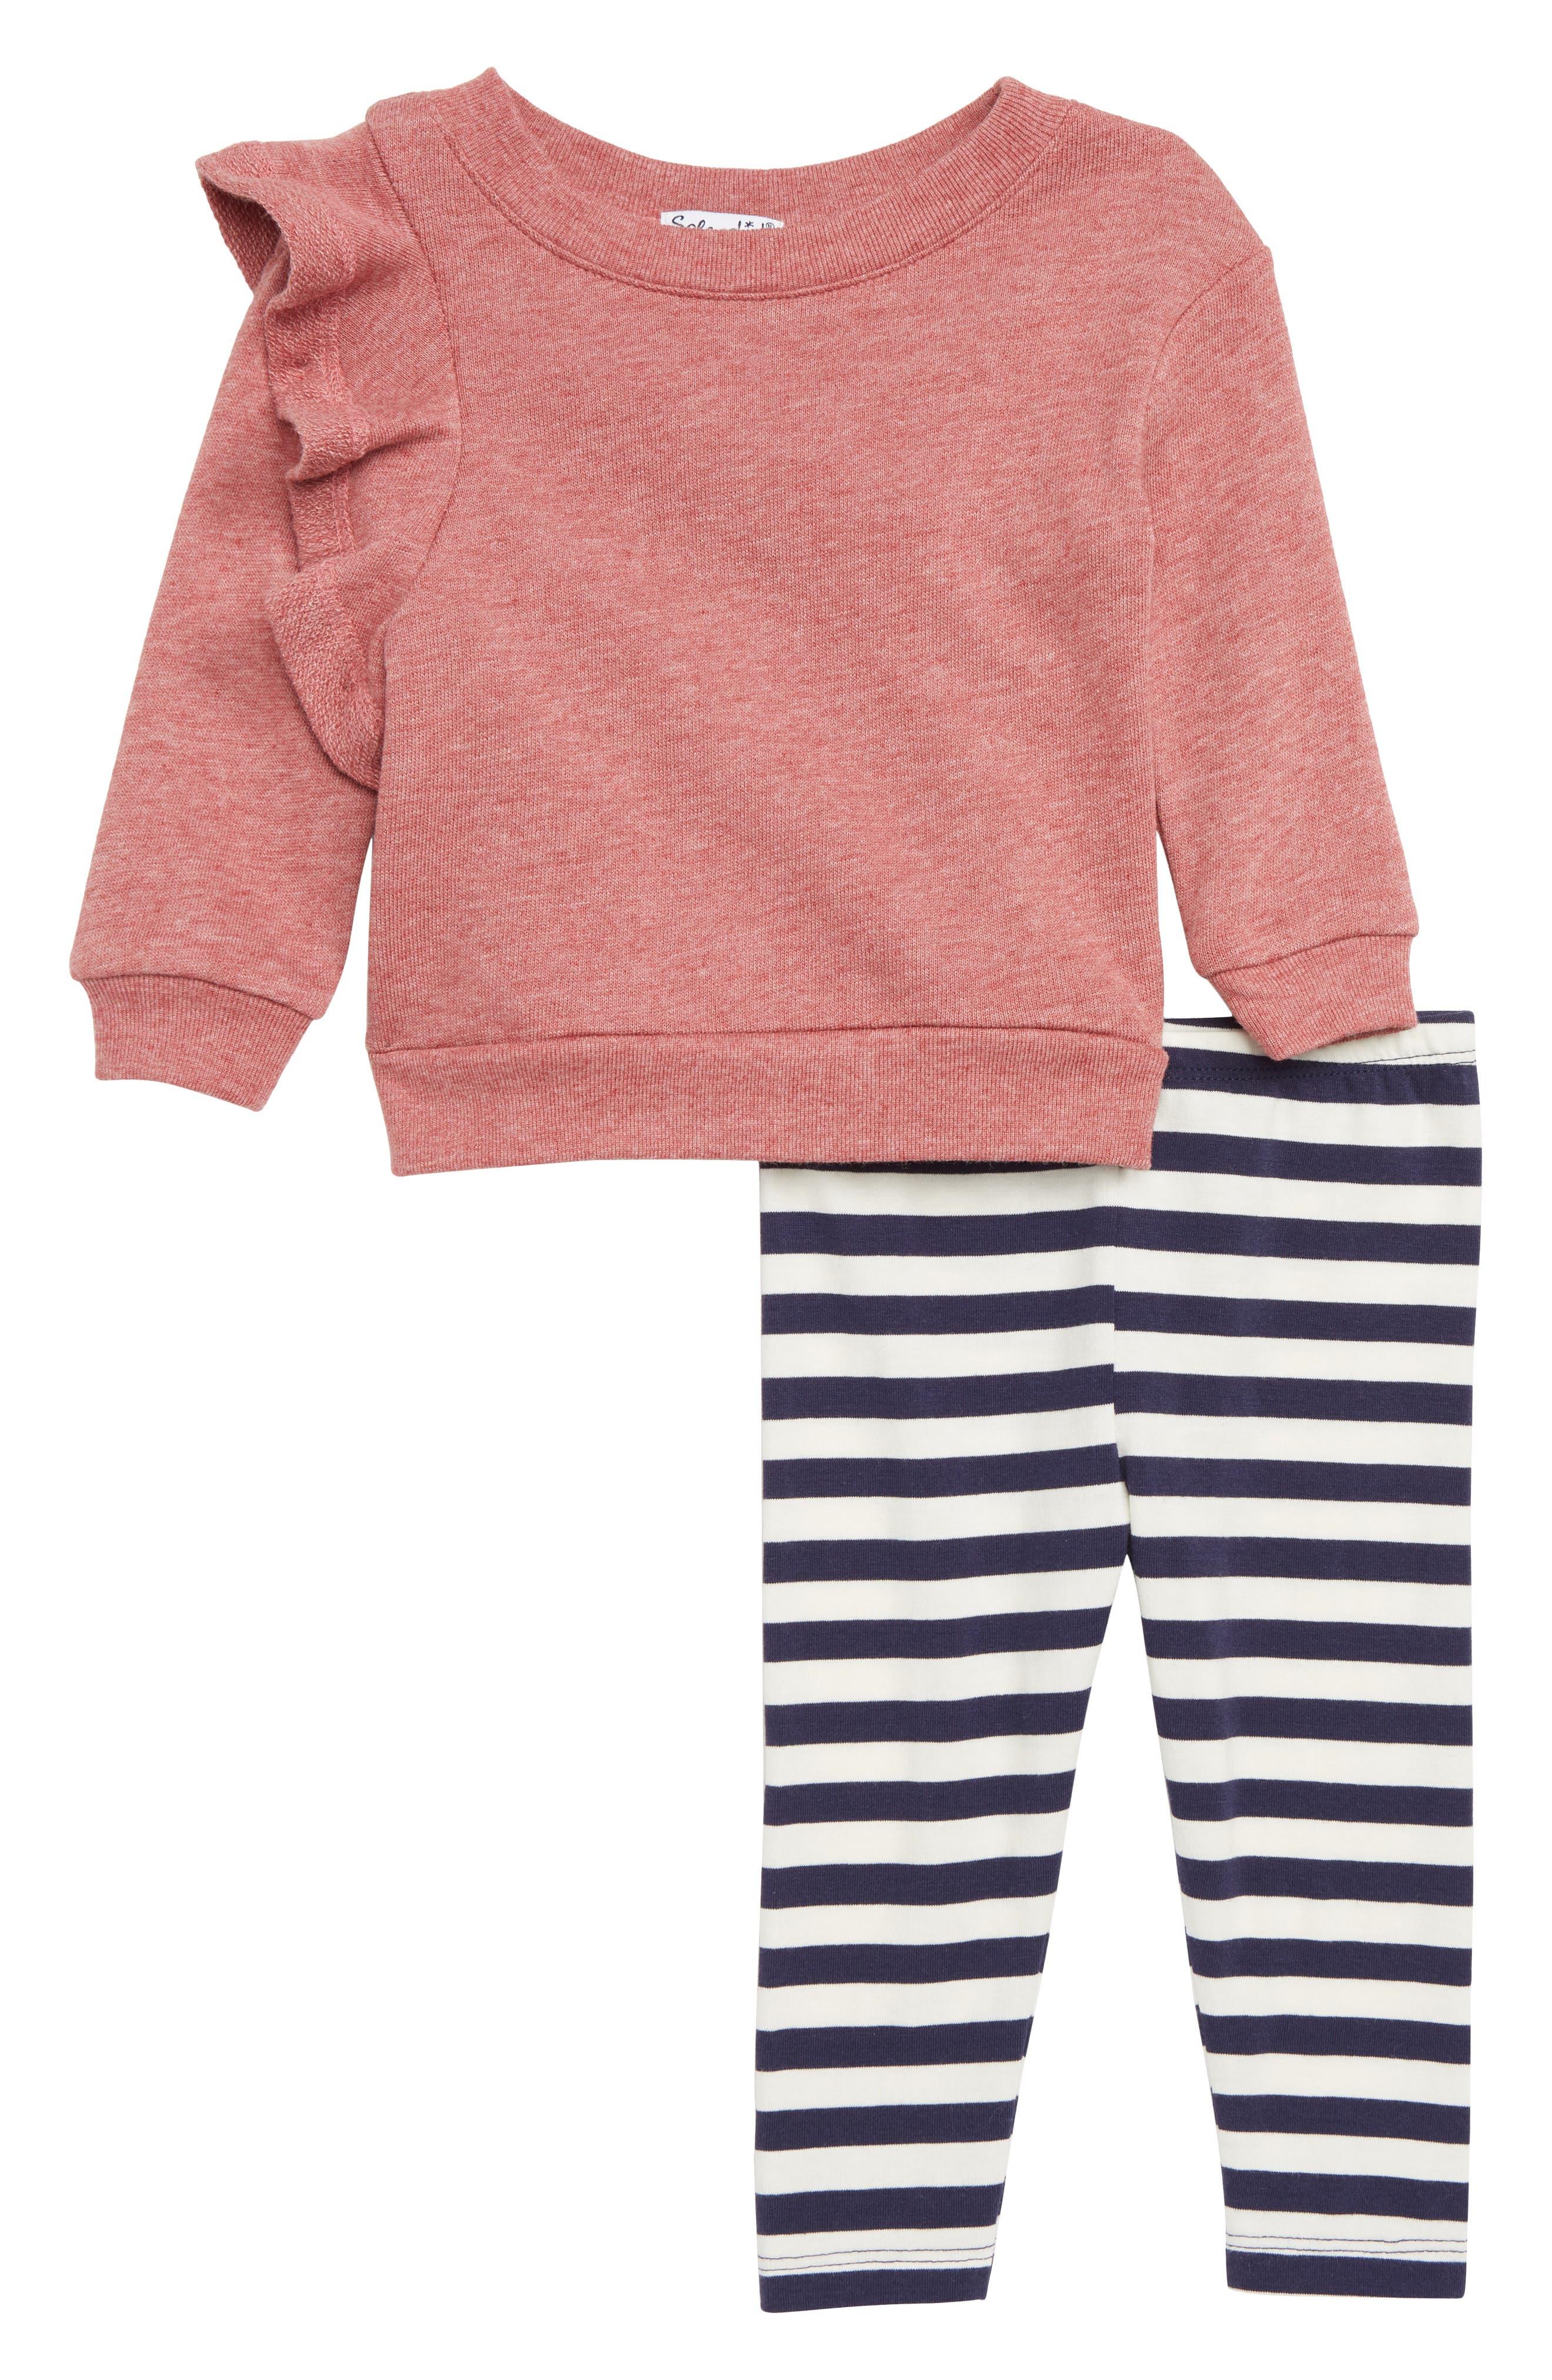 SPLENDID Ruffle Sweatshirt & Stripe Leggings Set, Main, color, 650